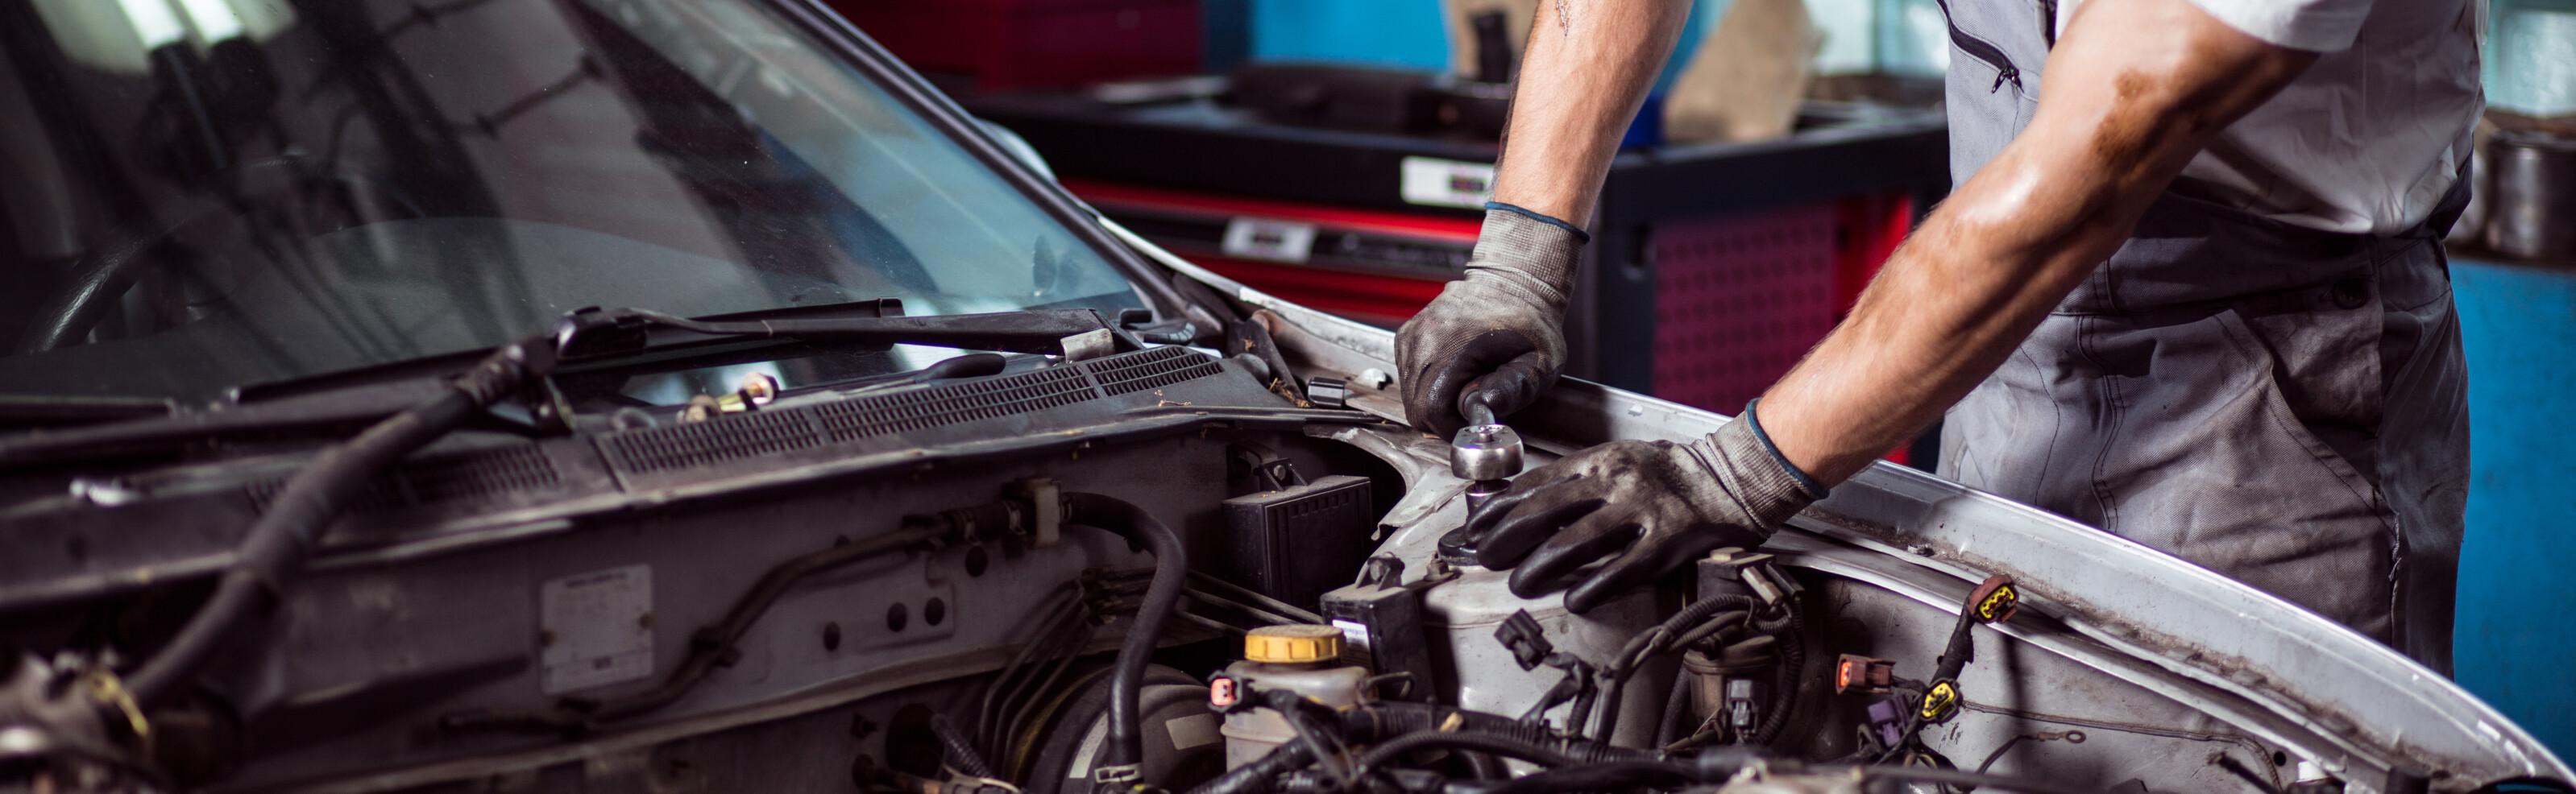 Collision Repair Technology | Thaddeus Stevens College